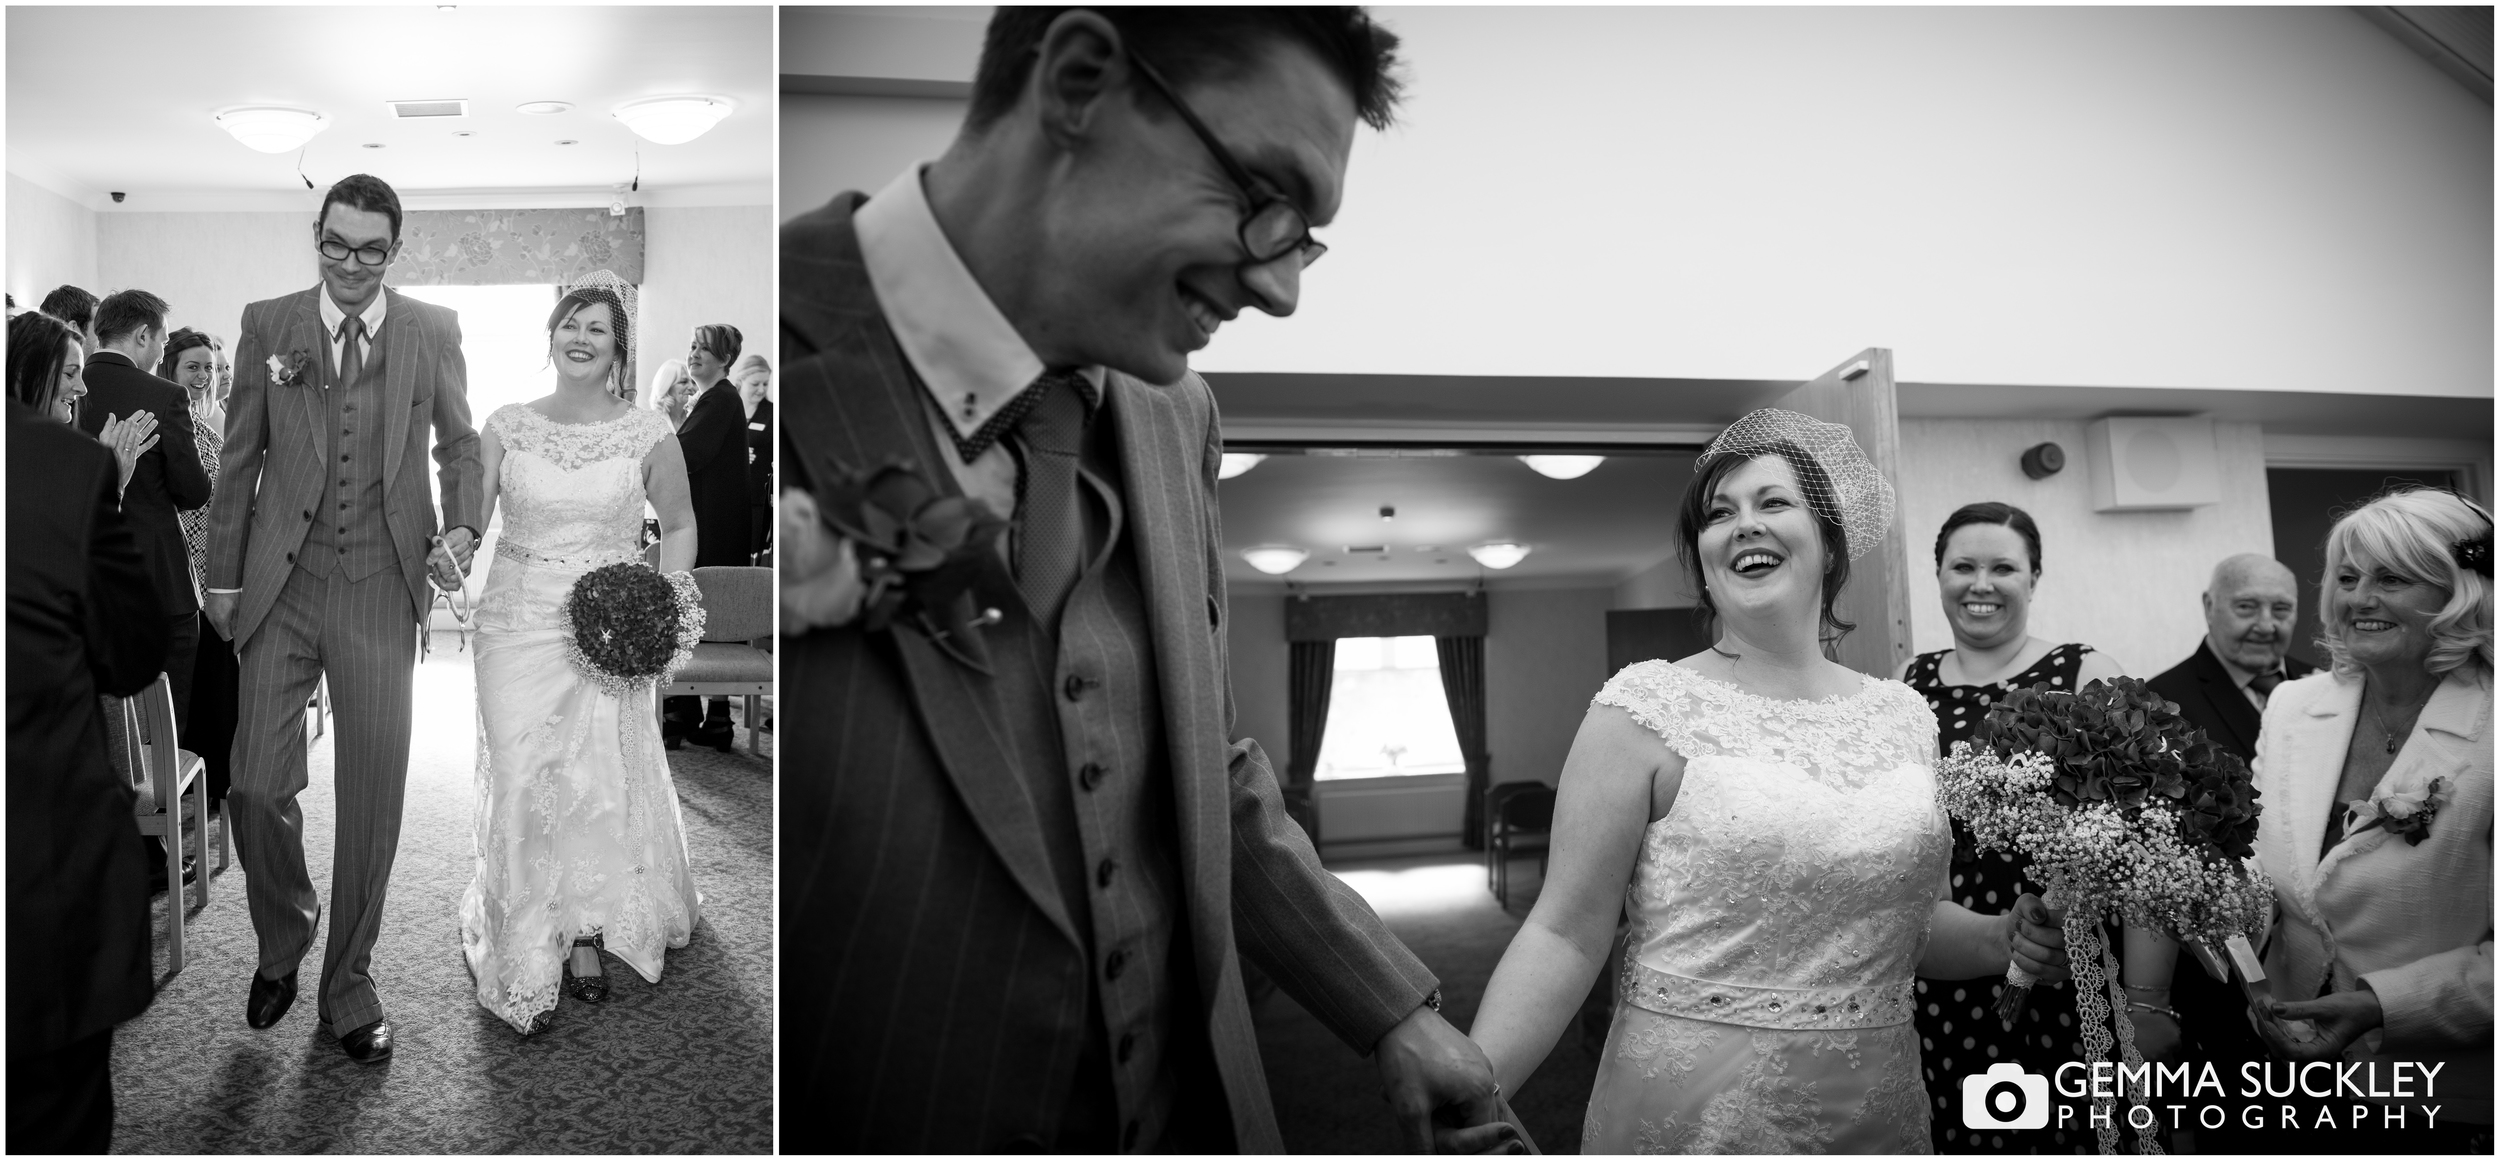 Whitby-wedding-photographypg.jpg